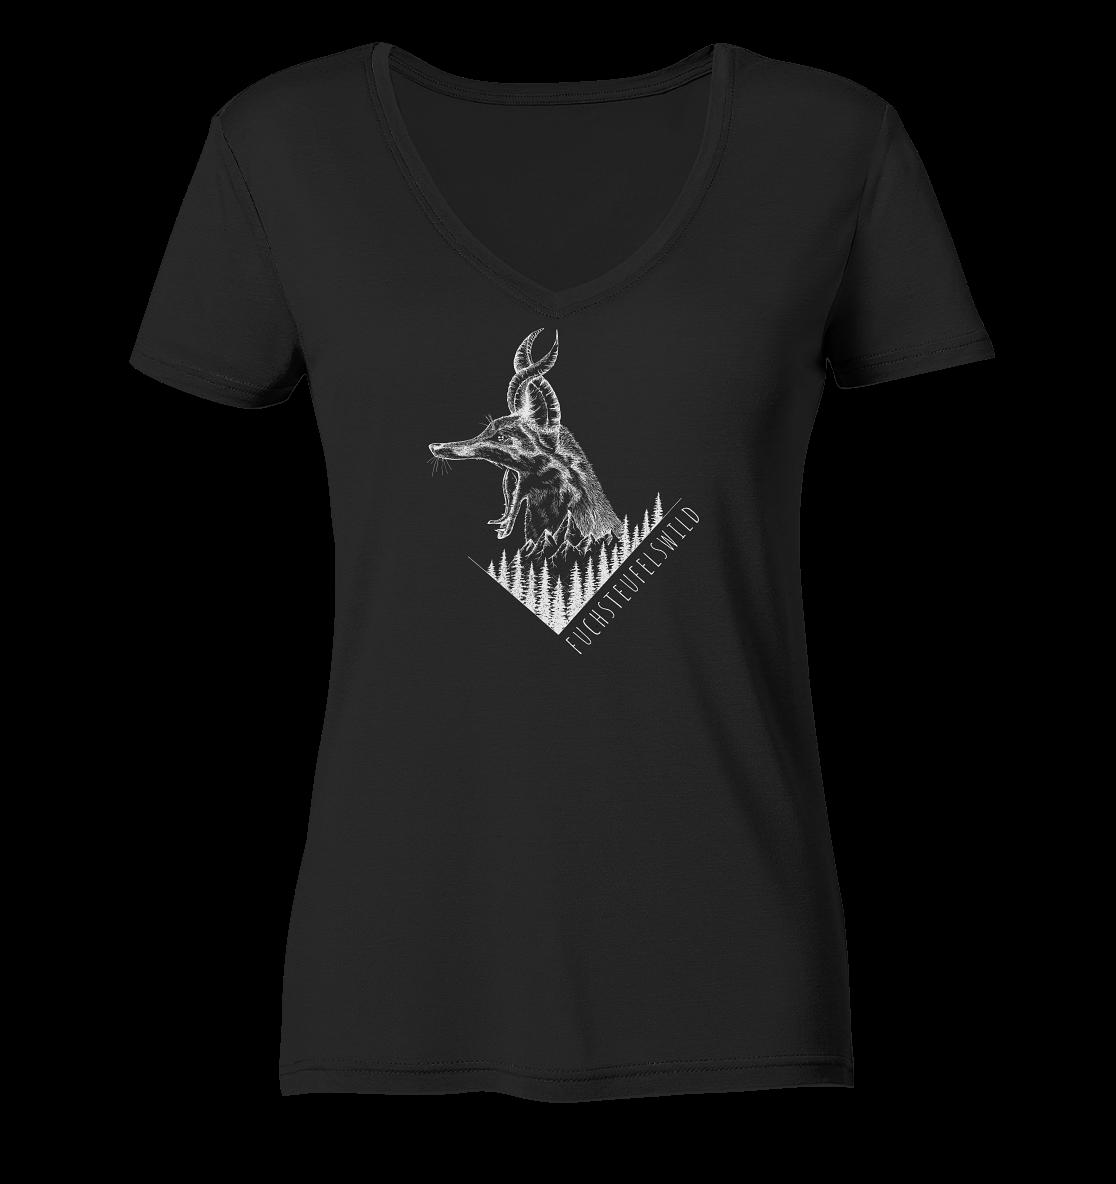 front-ladies-organic-v-neck-shirt-272727-1116x-11.png